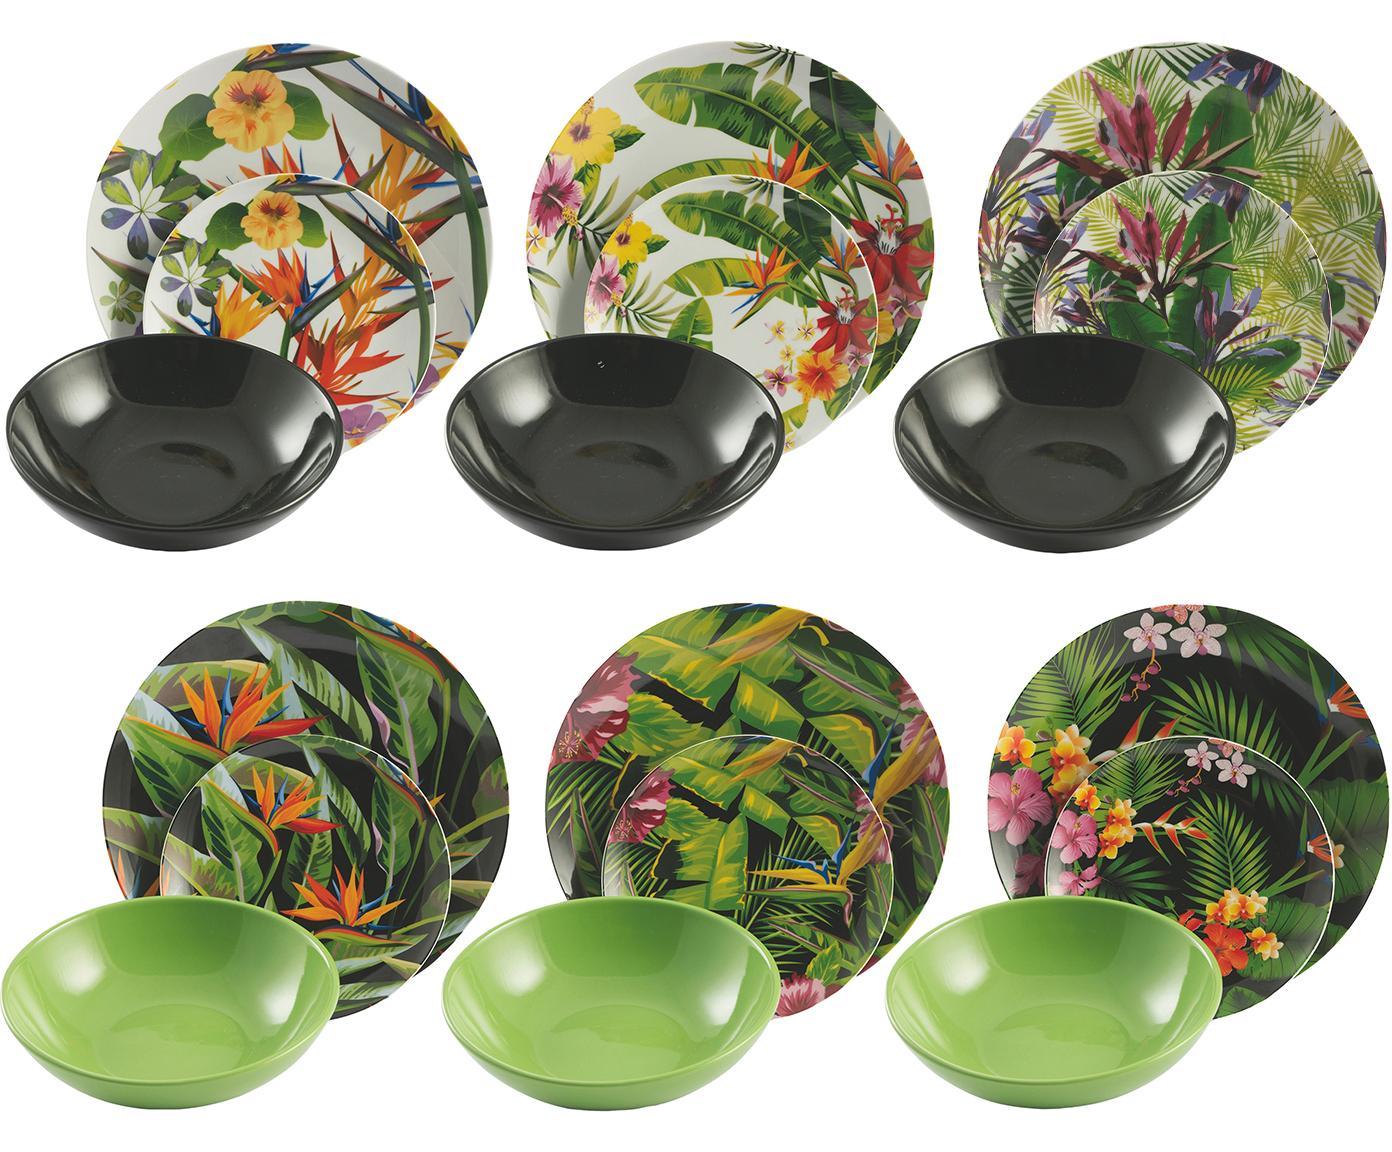 Serviesset Tropical Jungle, 6 personen (18-delig), Porselein, keramiek, Multicolour, Verschillende formaten